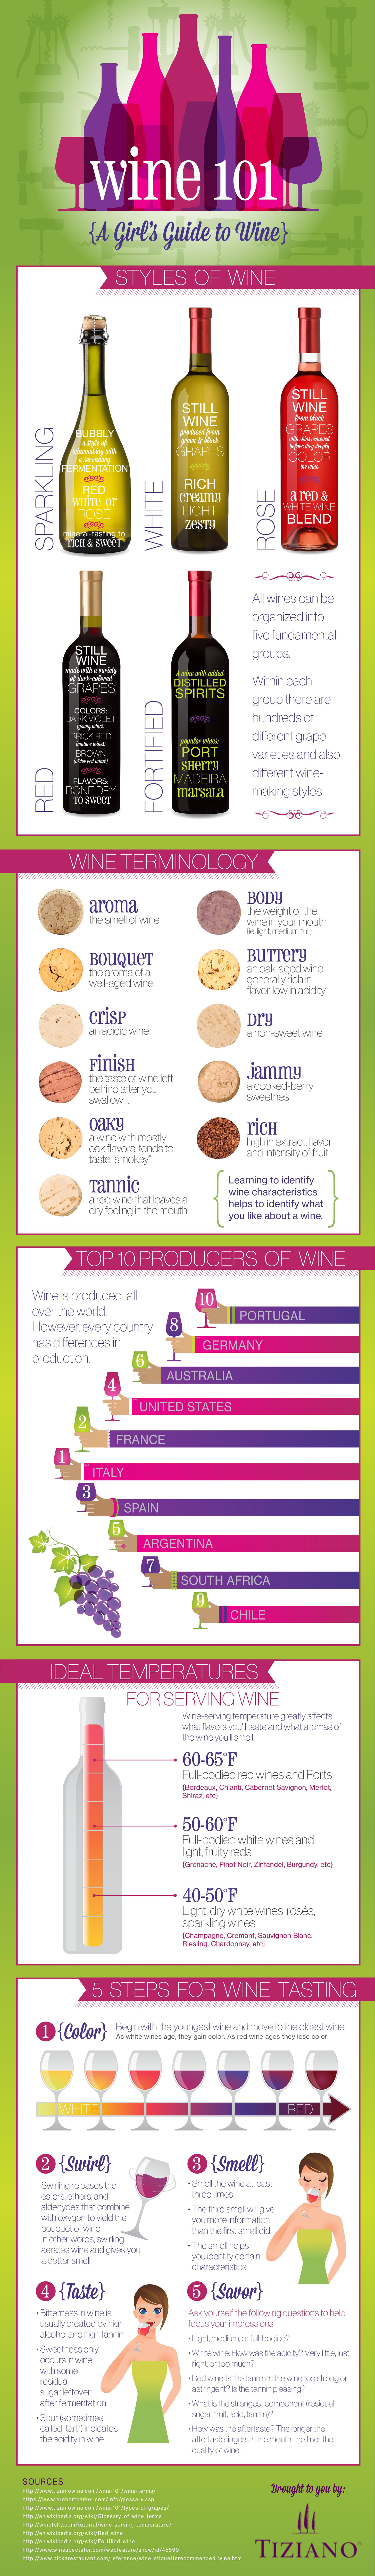 a girl's guide to wine infographic designed by #dezinegirl creative studio for IMI 10.21.13